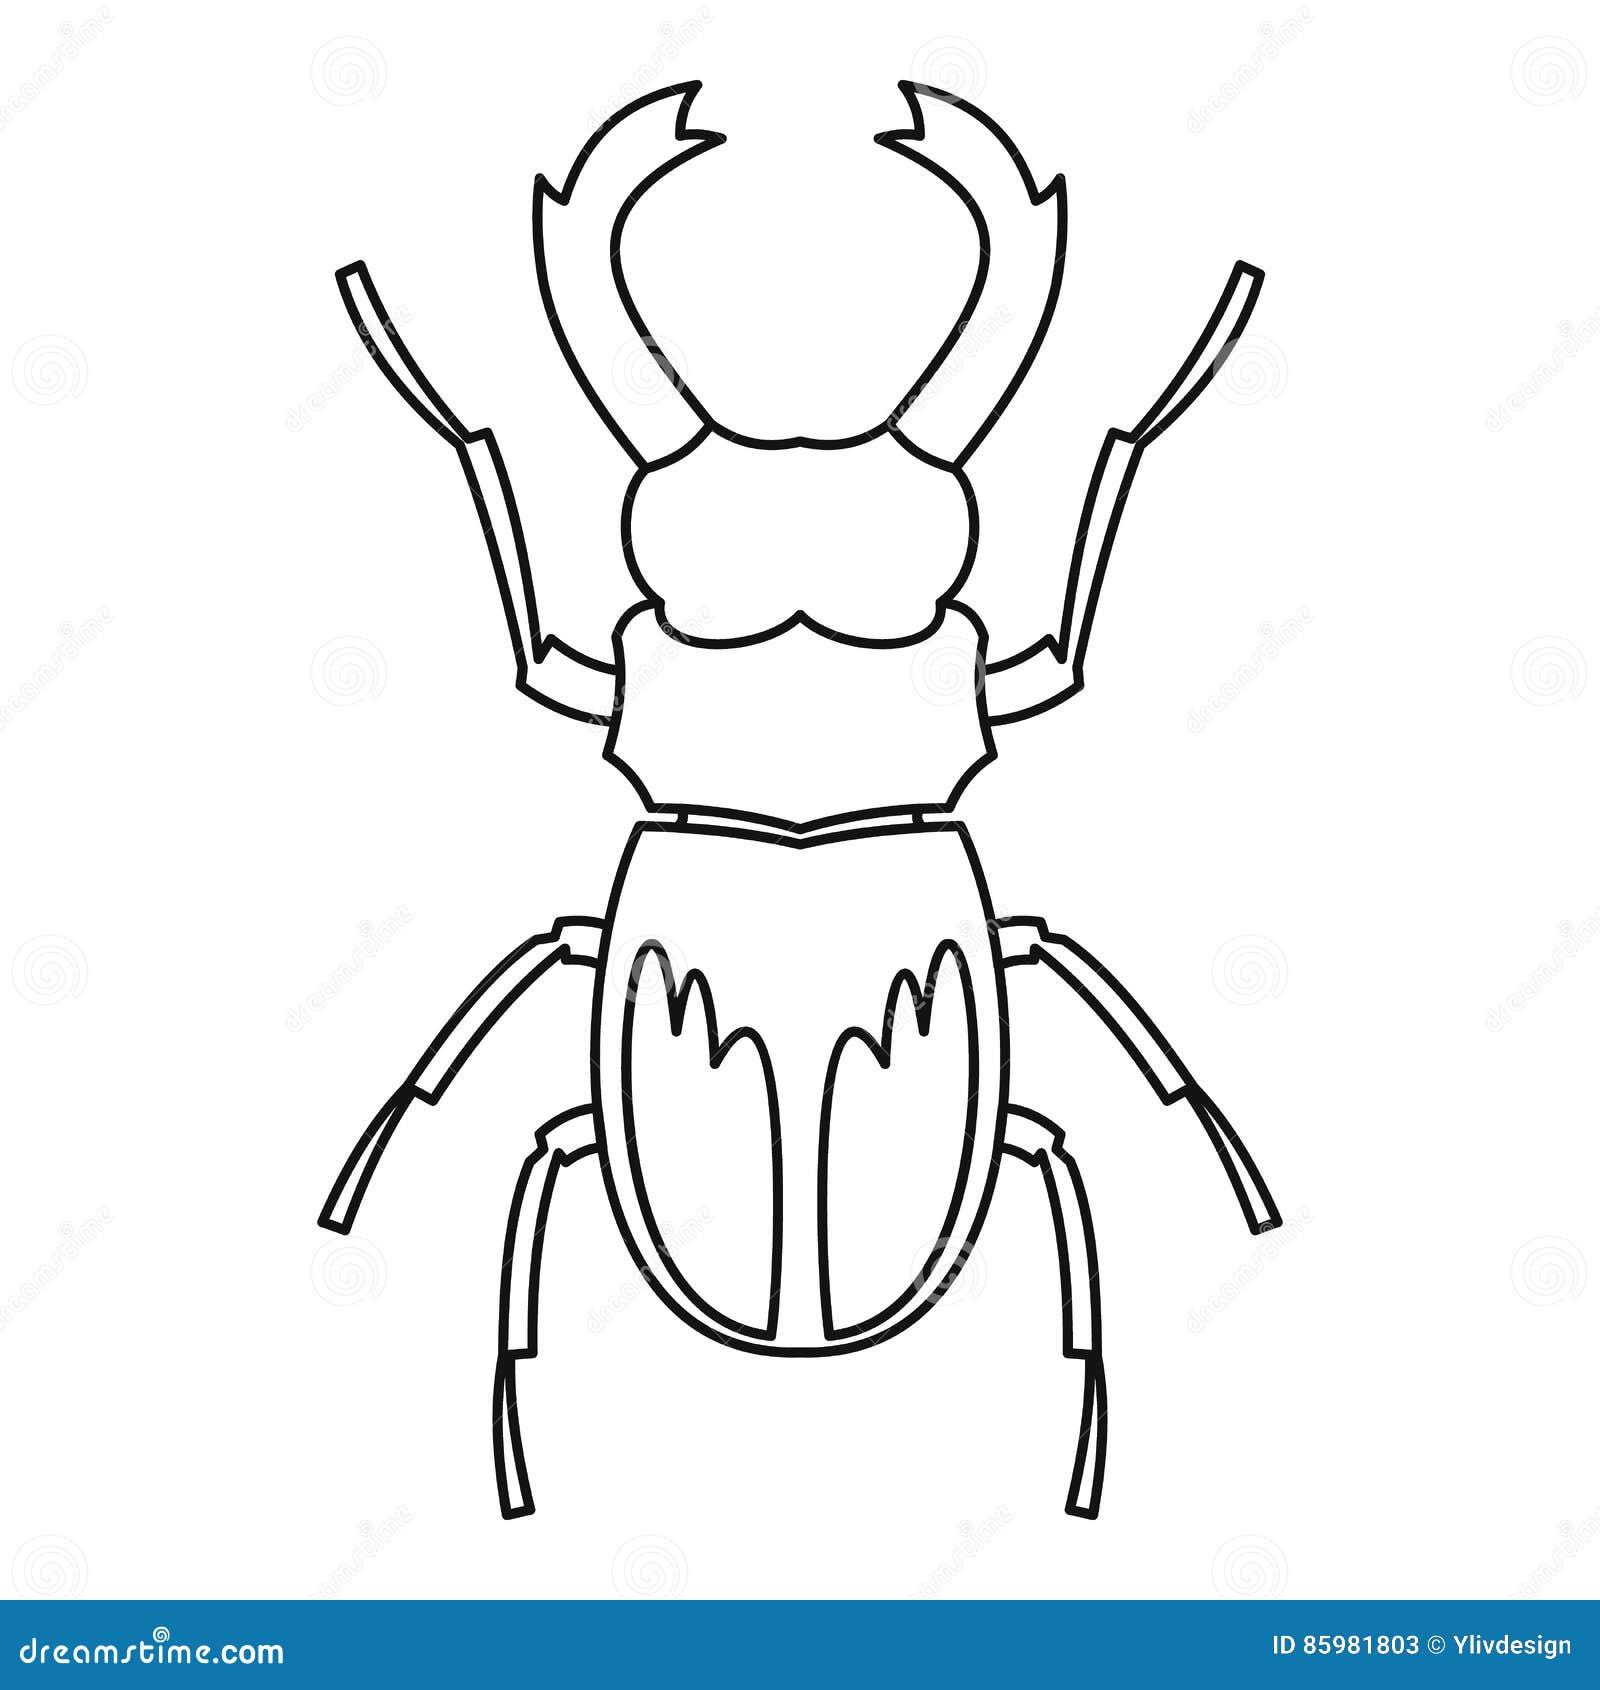 rhinoceros beetle icon outline style stock vector illustration of Praying Mantis rhinoceros beetle icon outline style